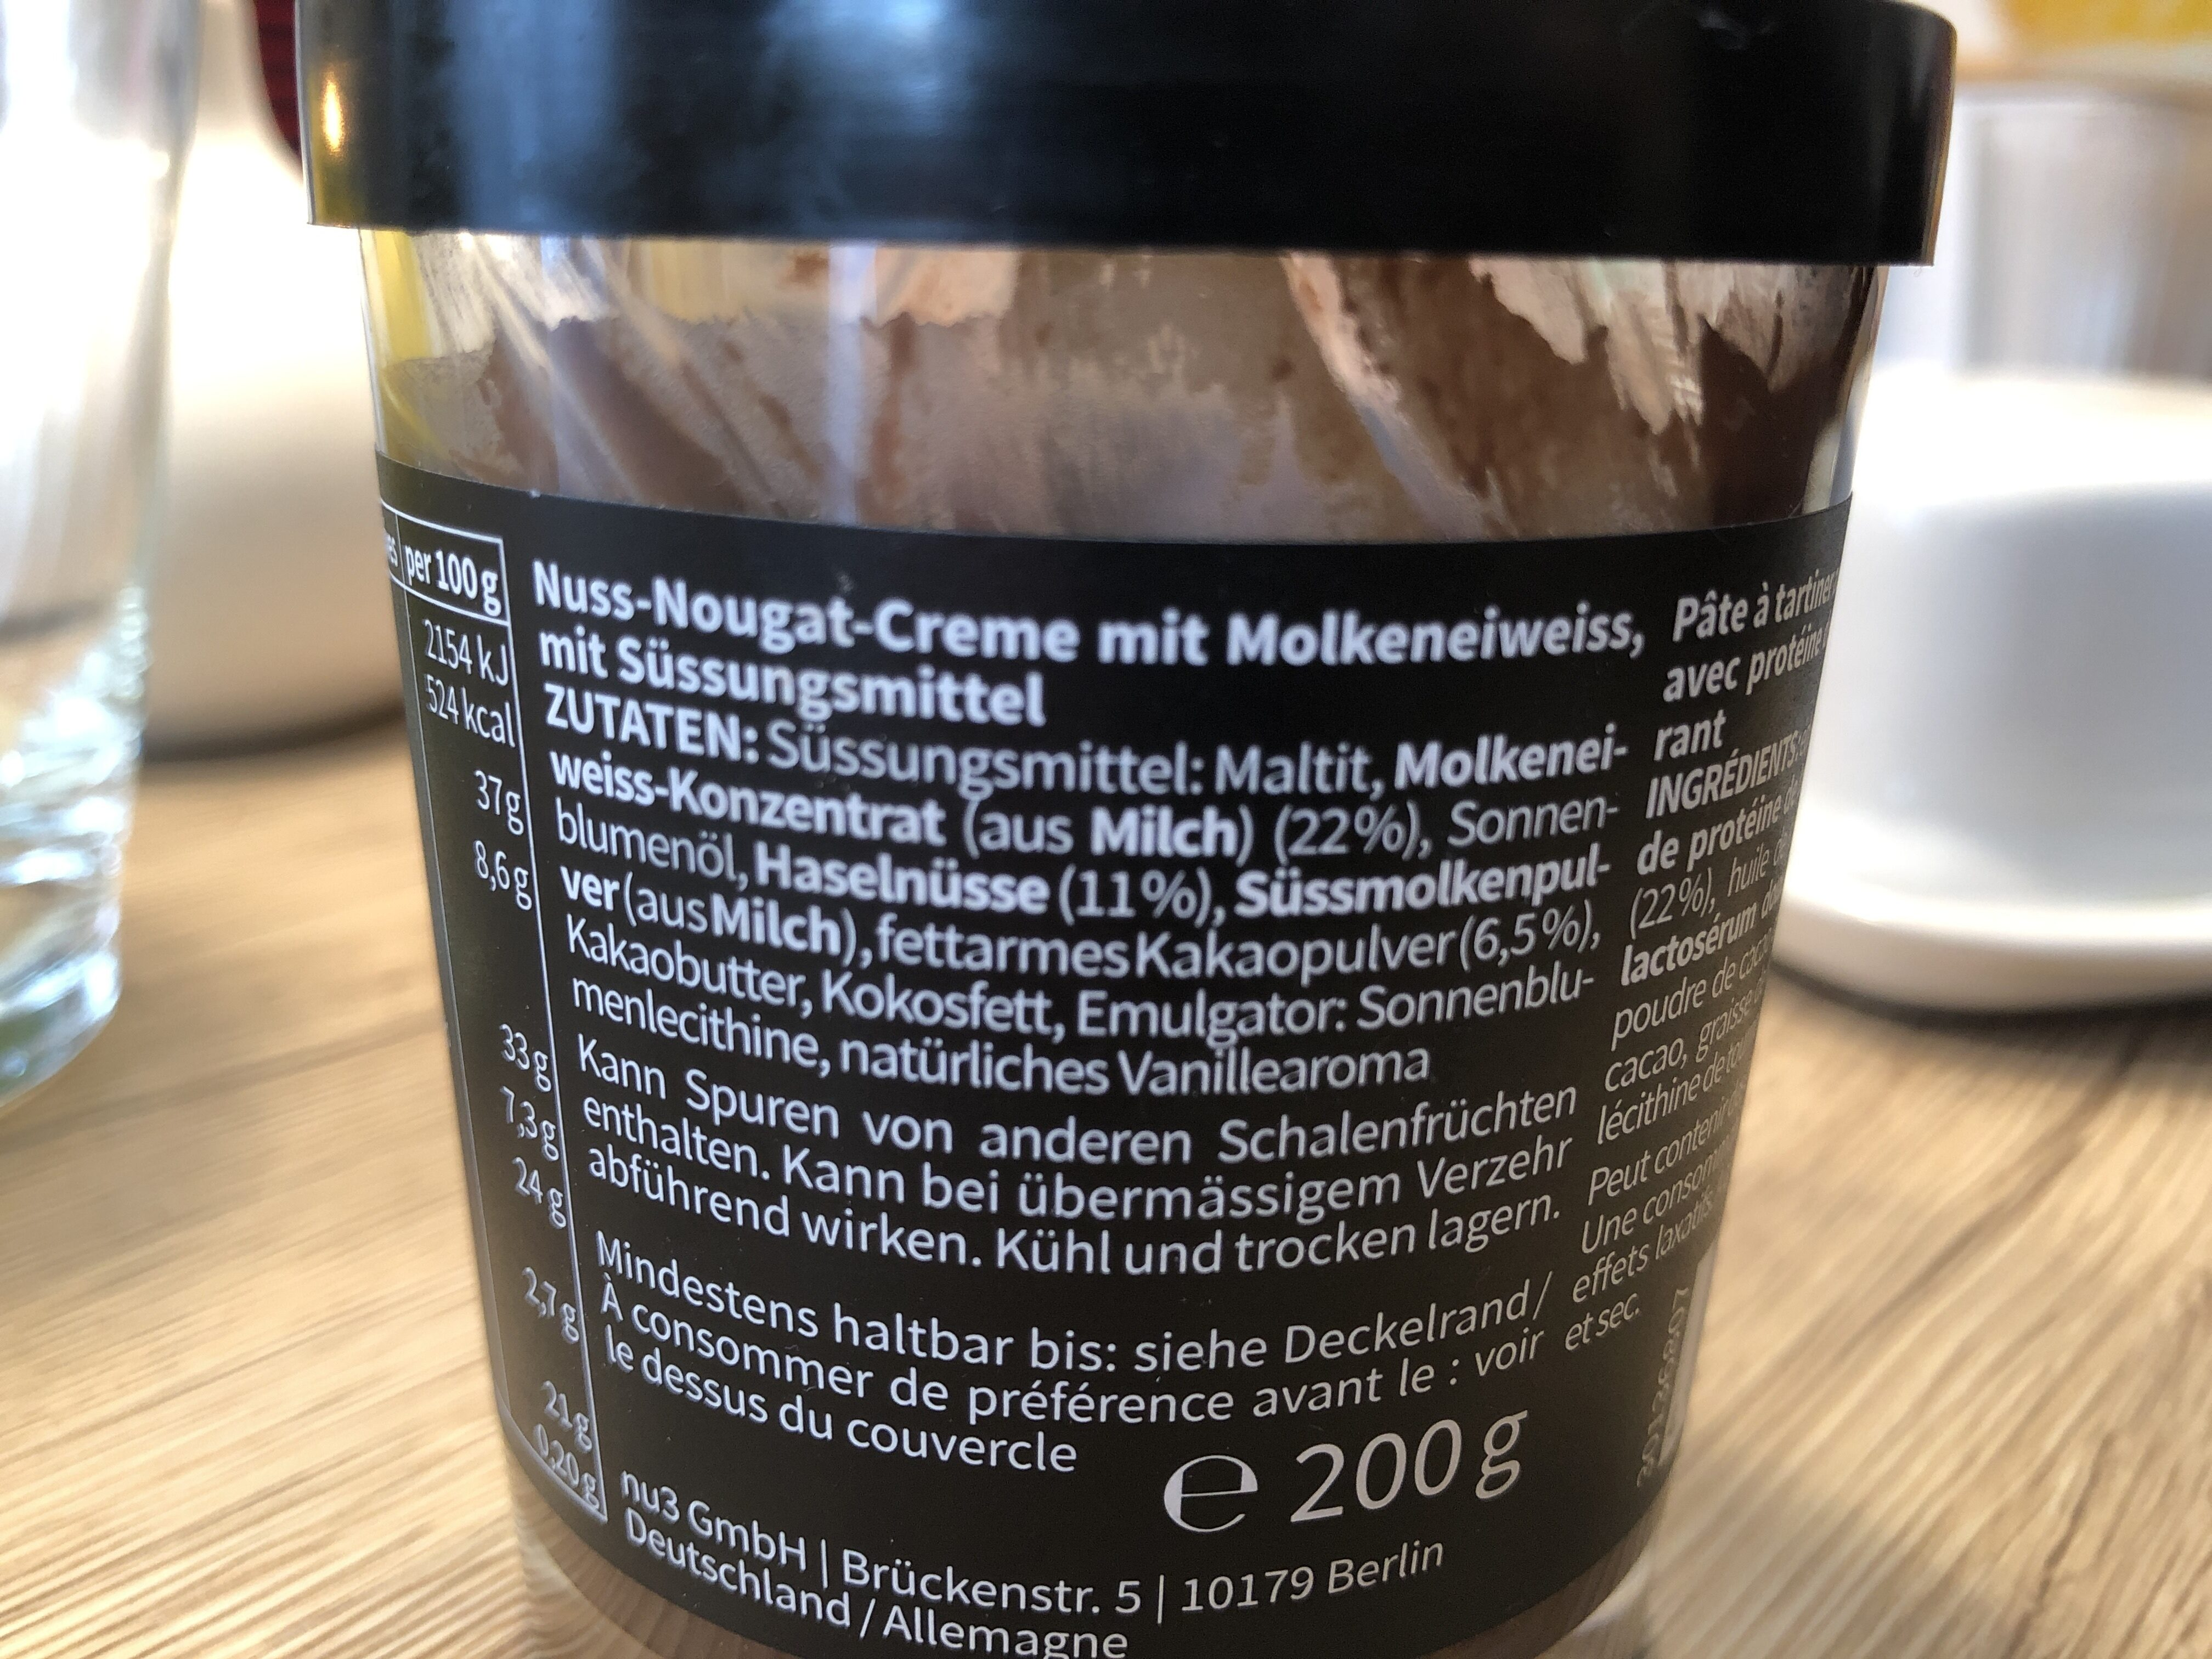 Fit proteine creme - Ingredients - fr